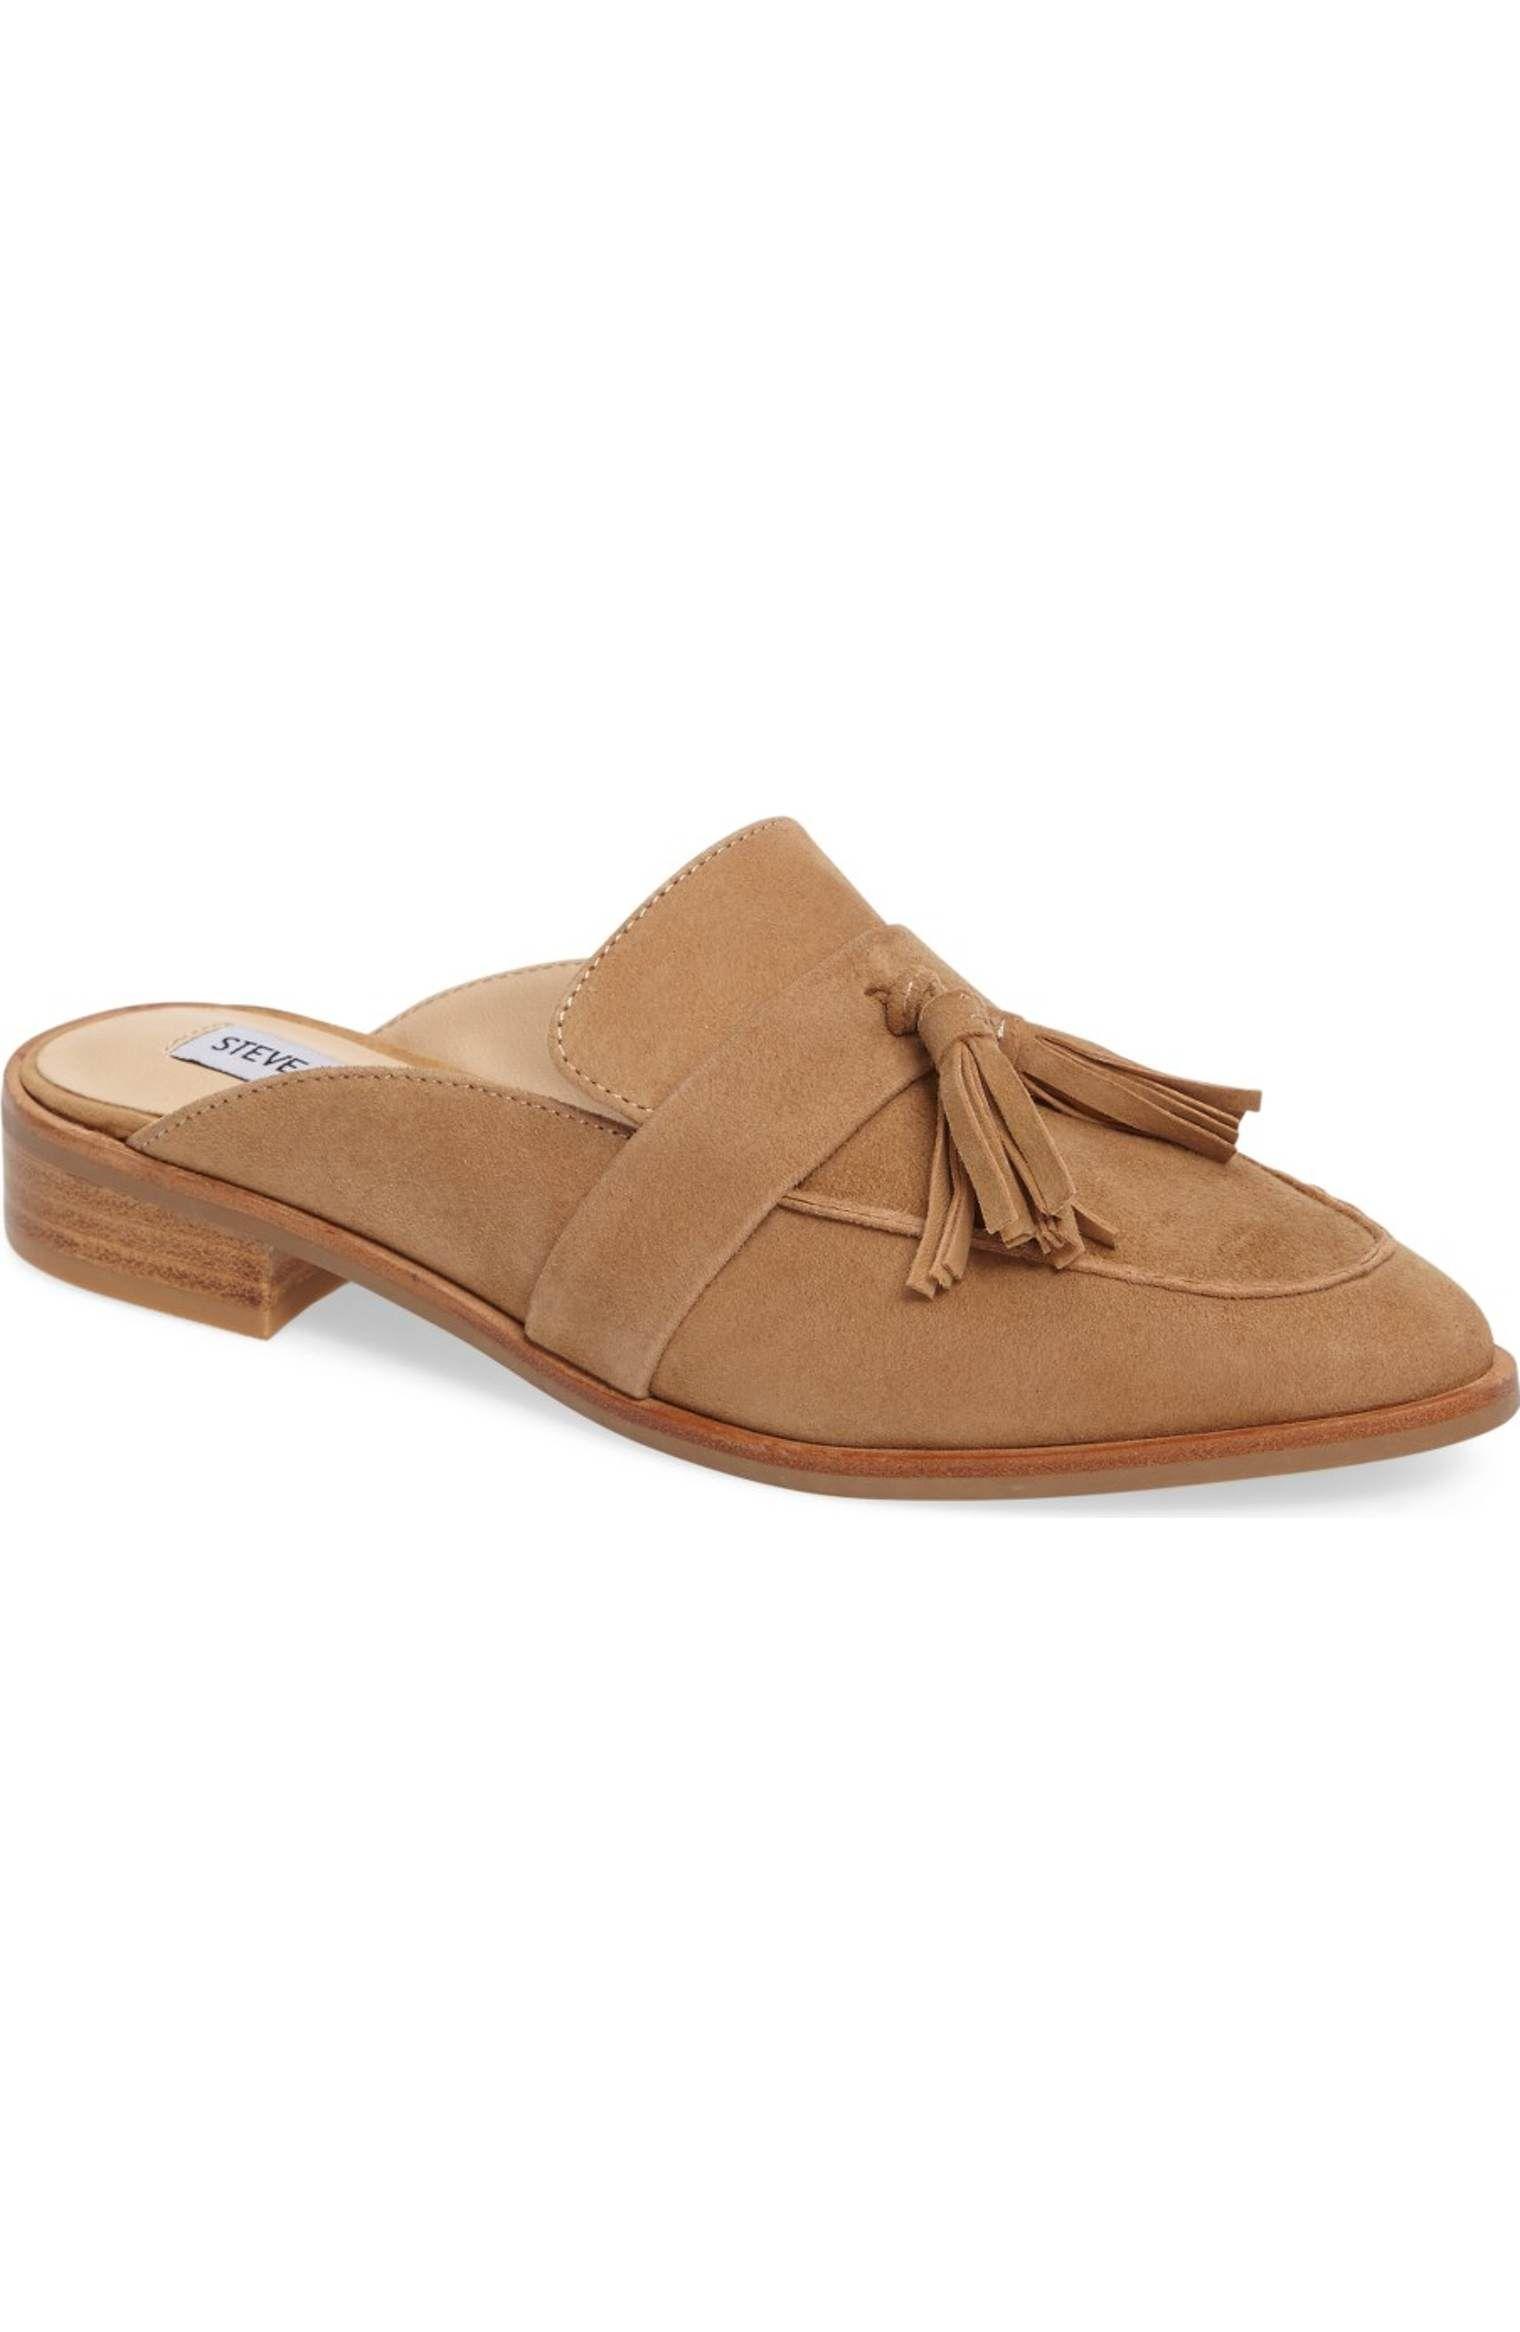 39401d591c0 Steve Madden Magan Tasseled Mule :: | :: SHOES :: | Shoes, Spring ...